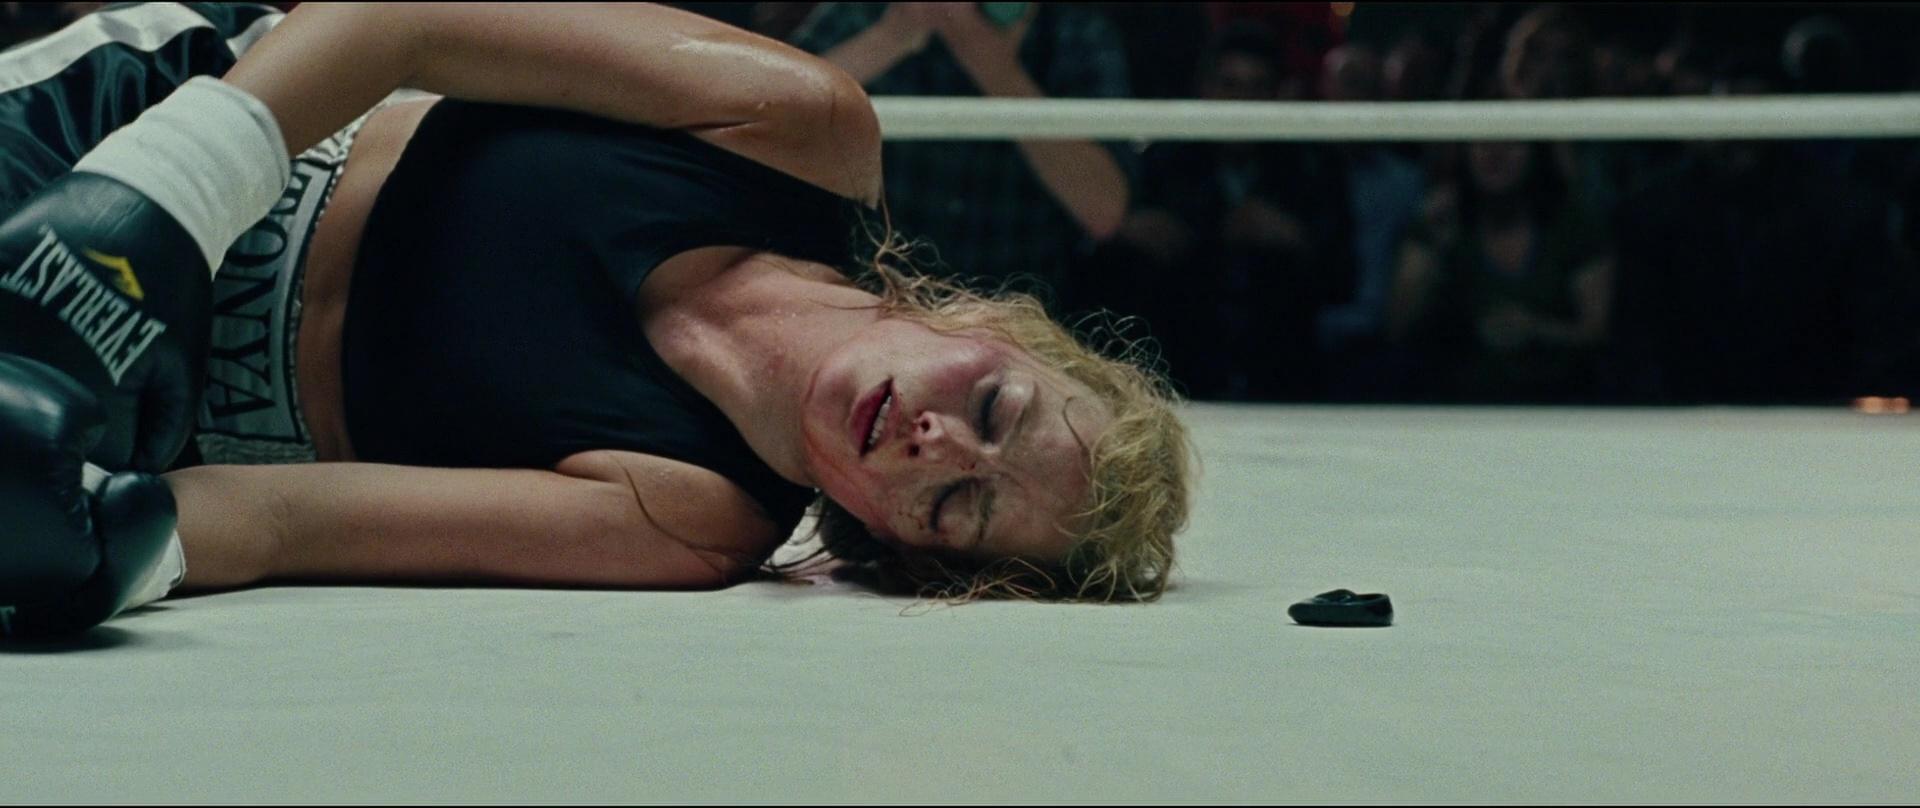 Everlast-Boxing-Gloves-Worn-by-Margot-Robbie-in-I-Tonya-3